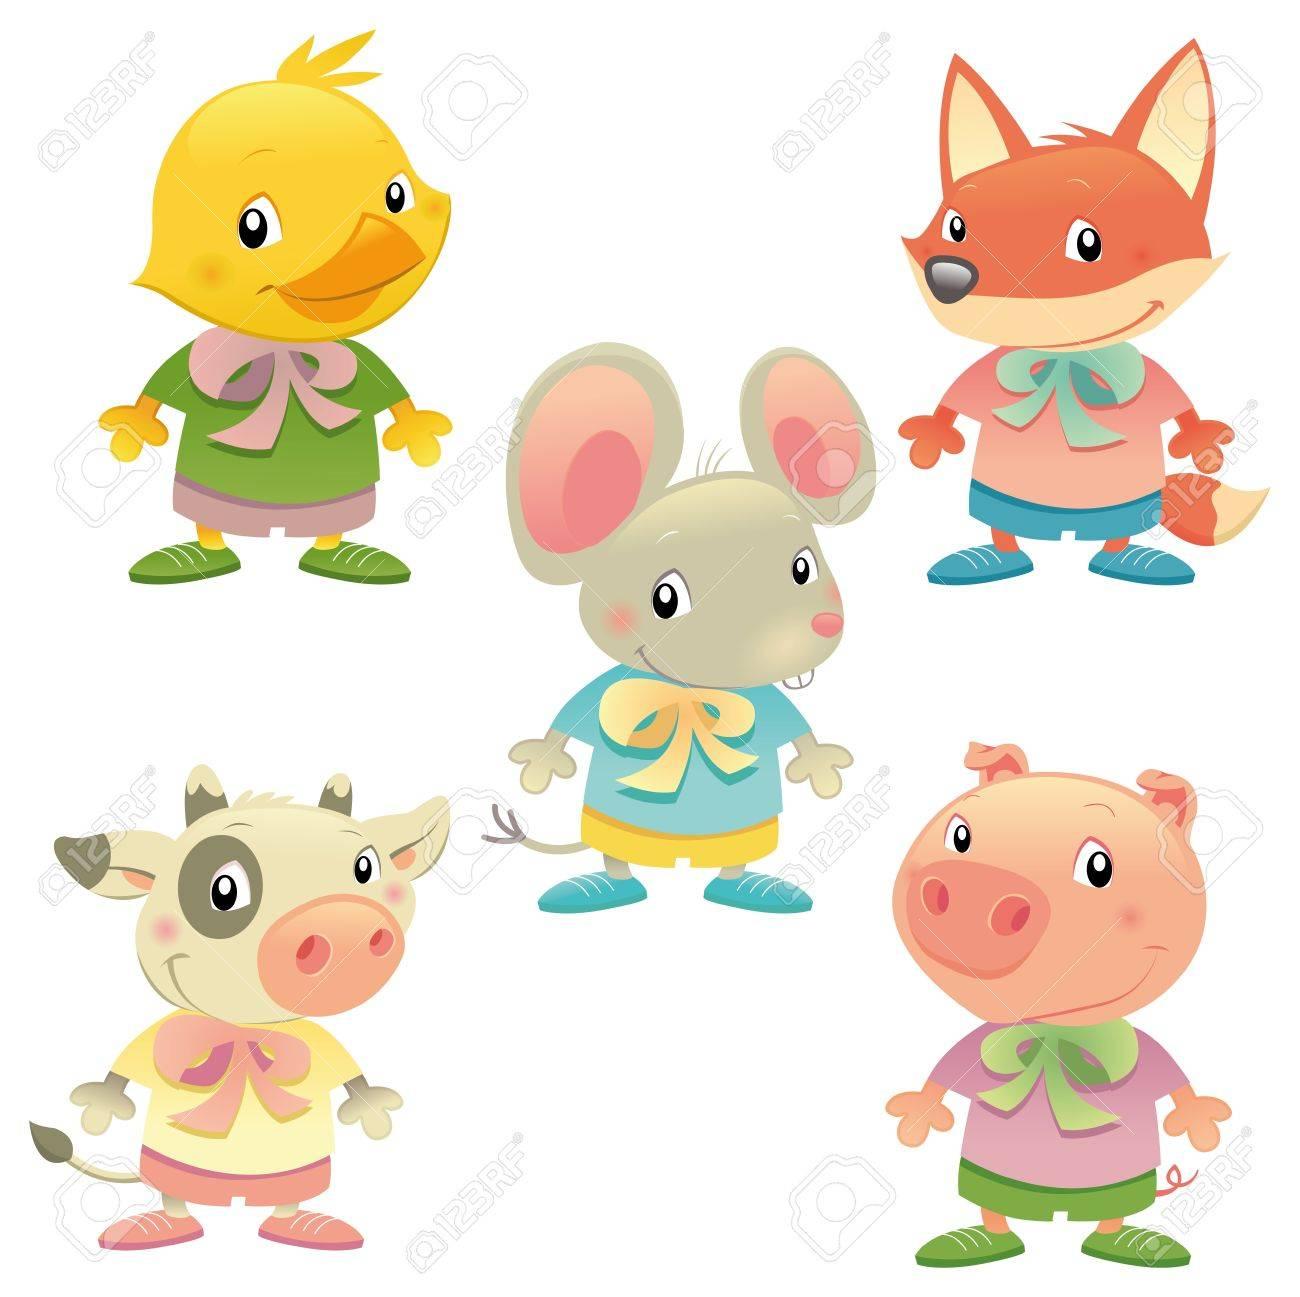 Cute animal family. Stock Vector - 13535796